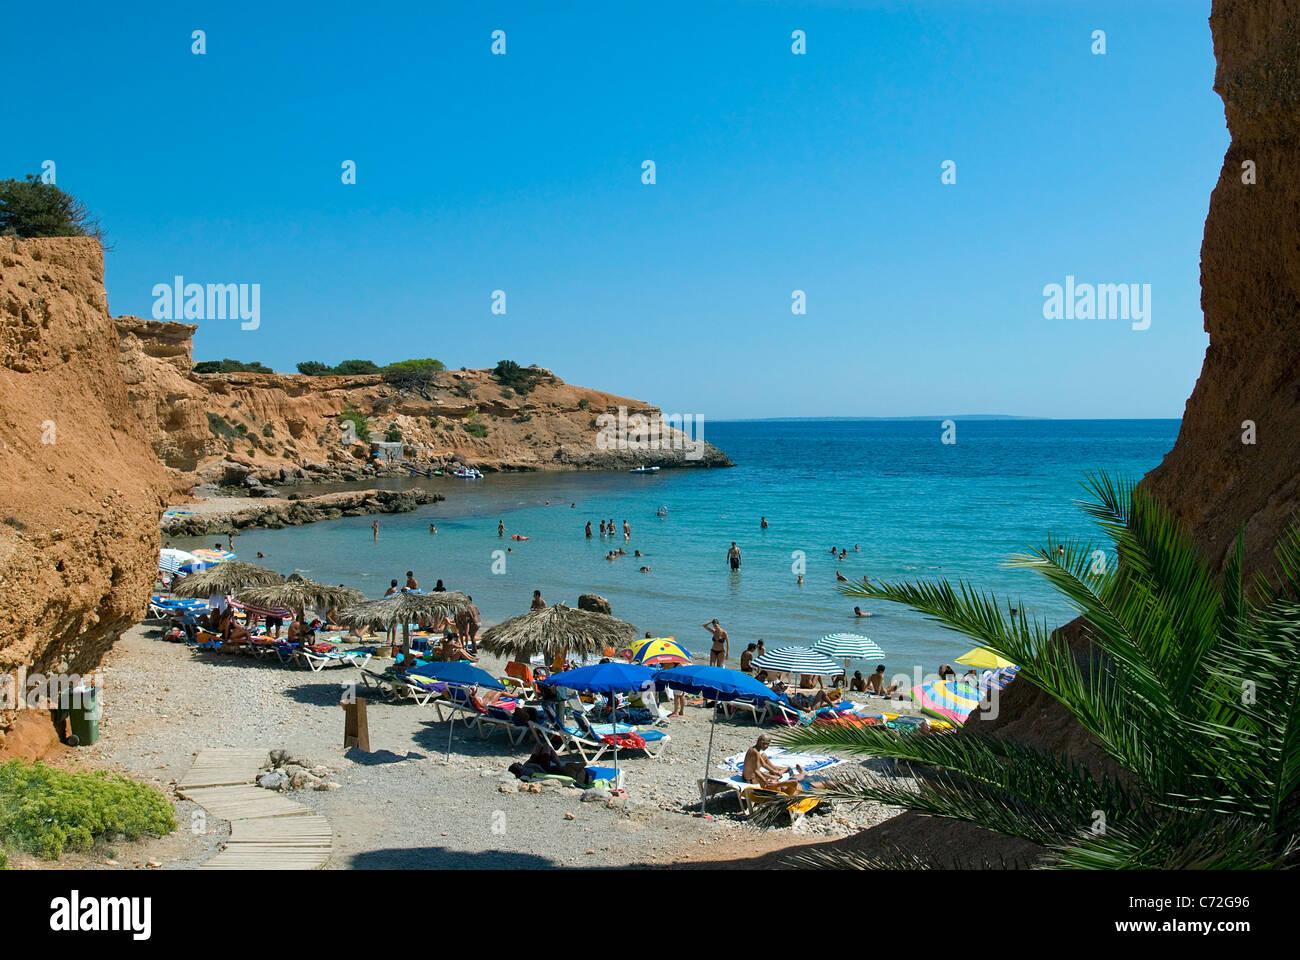 Beach at Sa Caleta, Ibiza, Balearics, Spain - Stock Image